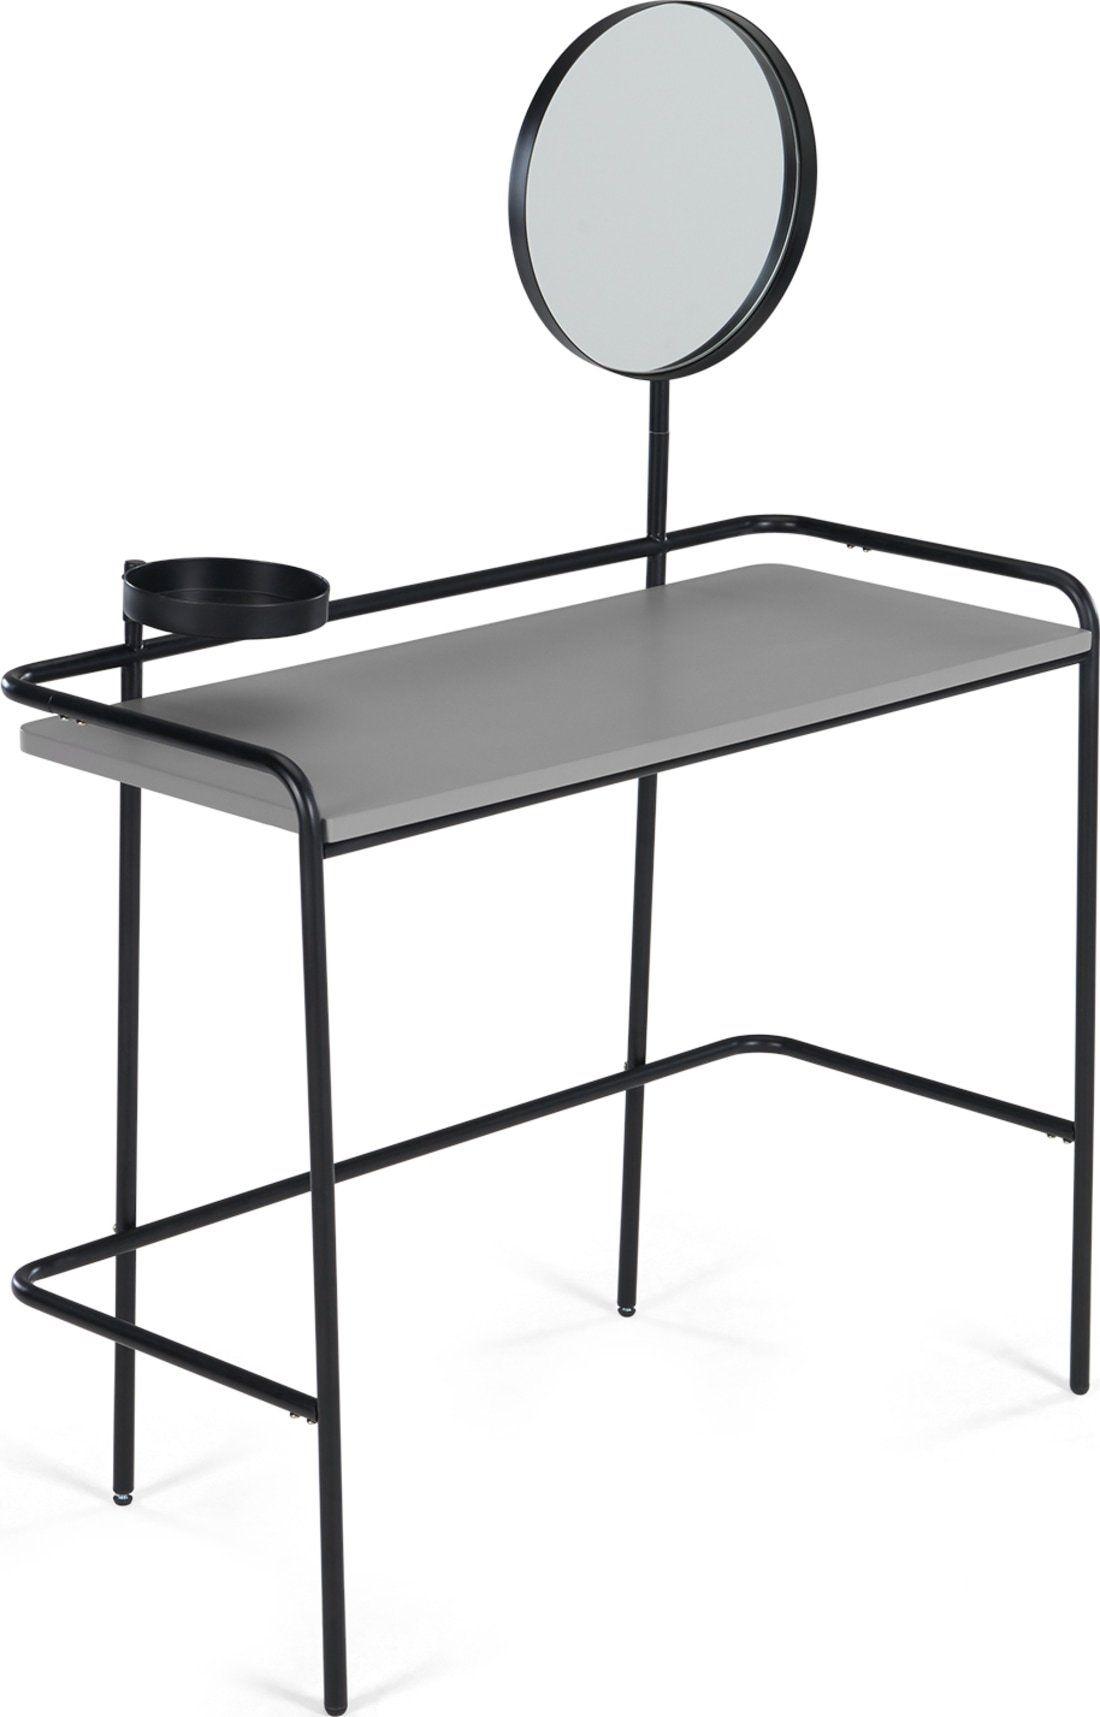 Best Essentials Alana Dressing Table Black In 2020 Black 400 x 300